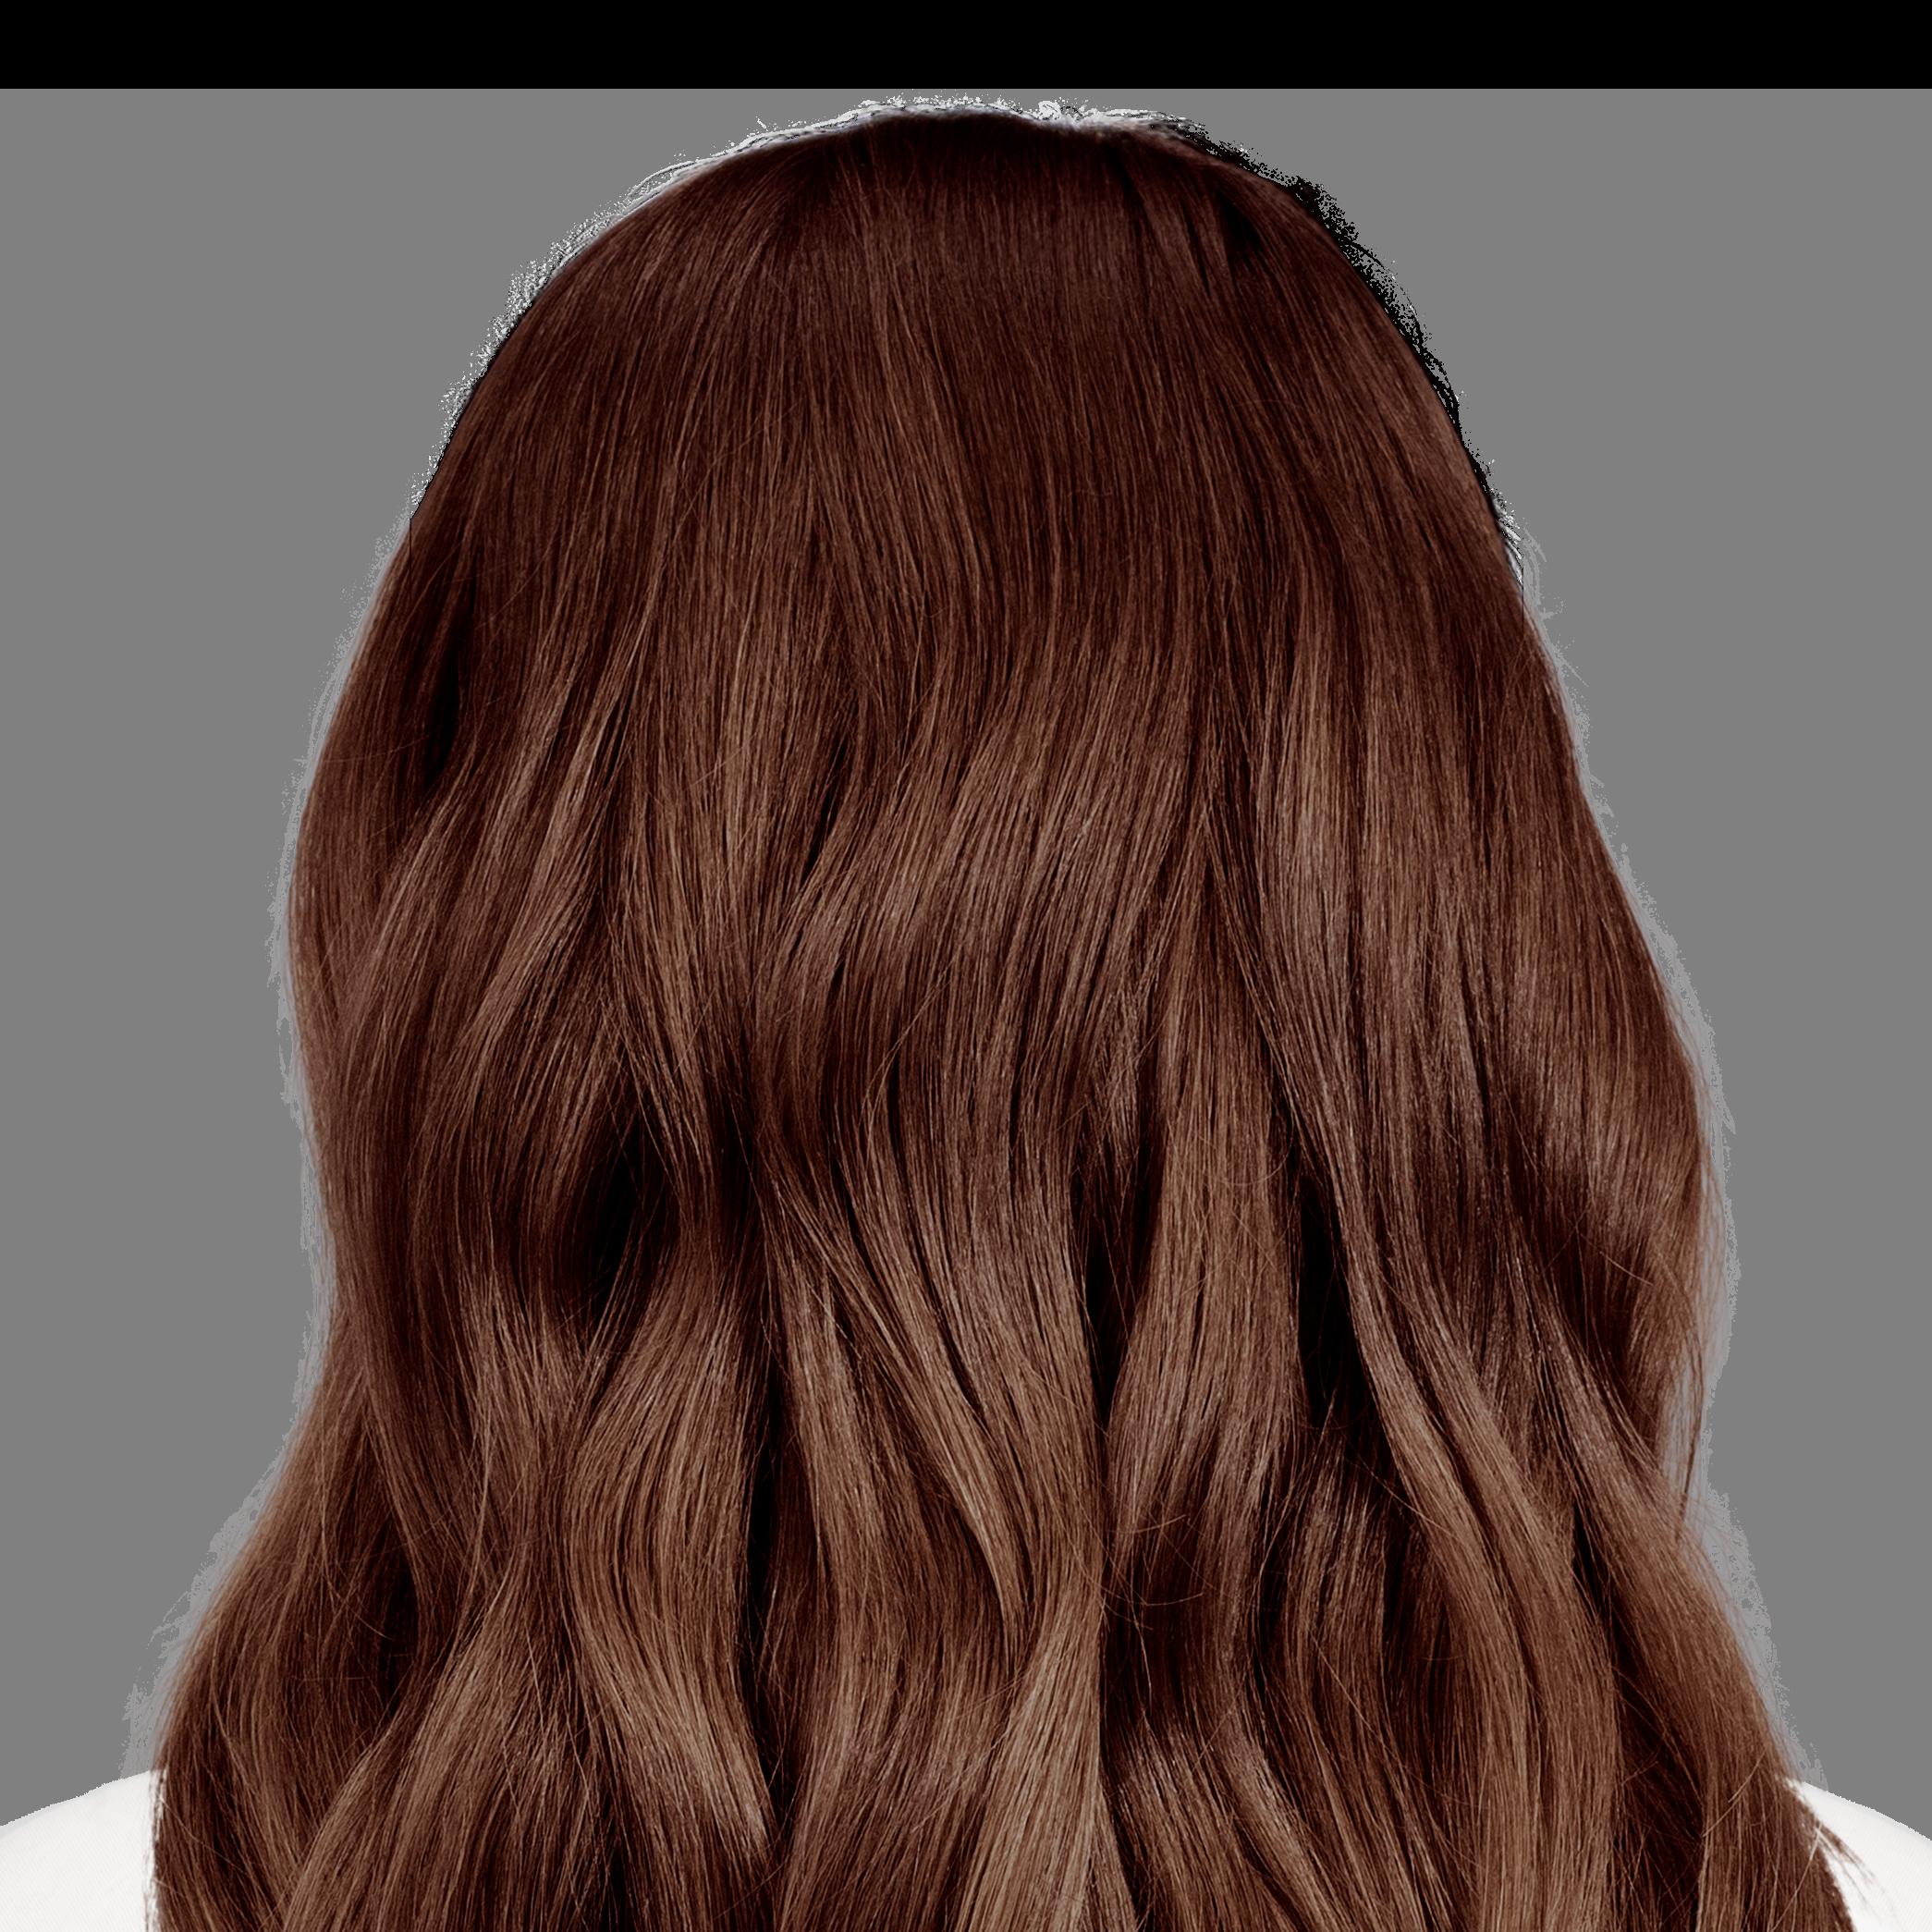 Novara Light Brown - True light brown for maximum gray coverage